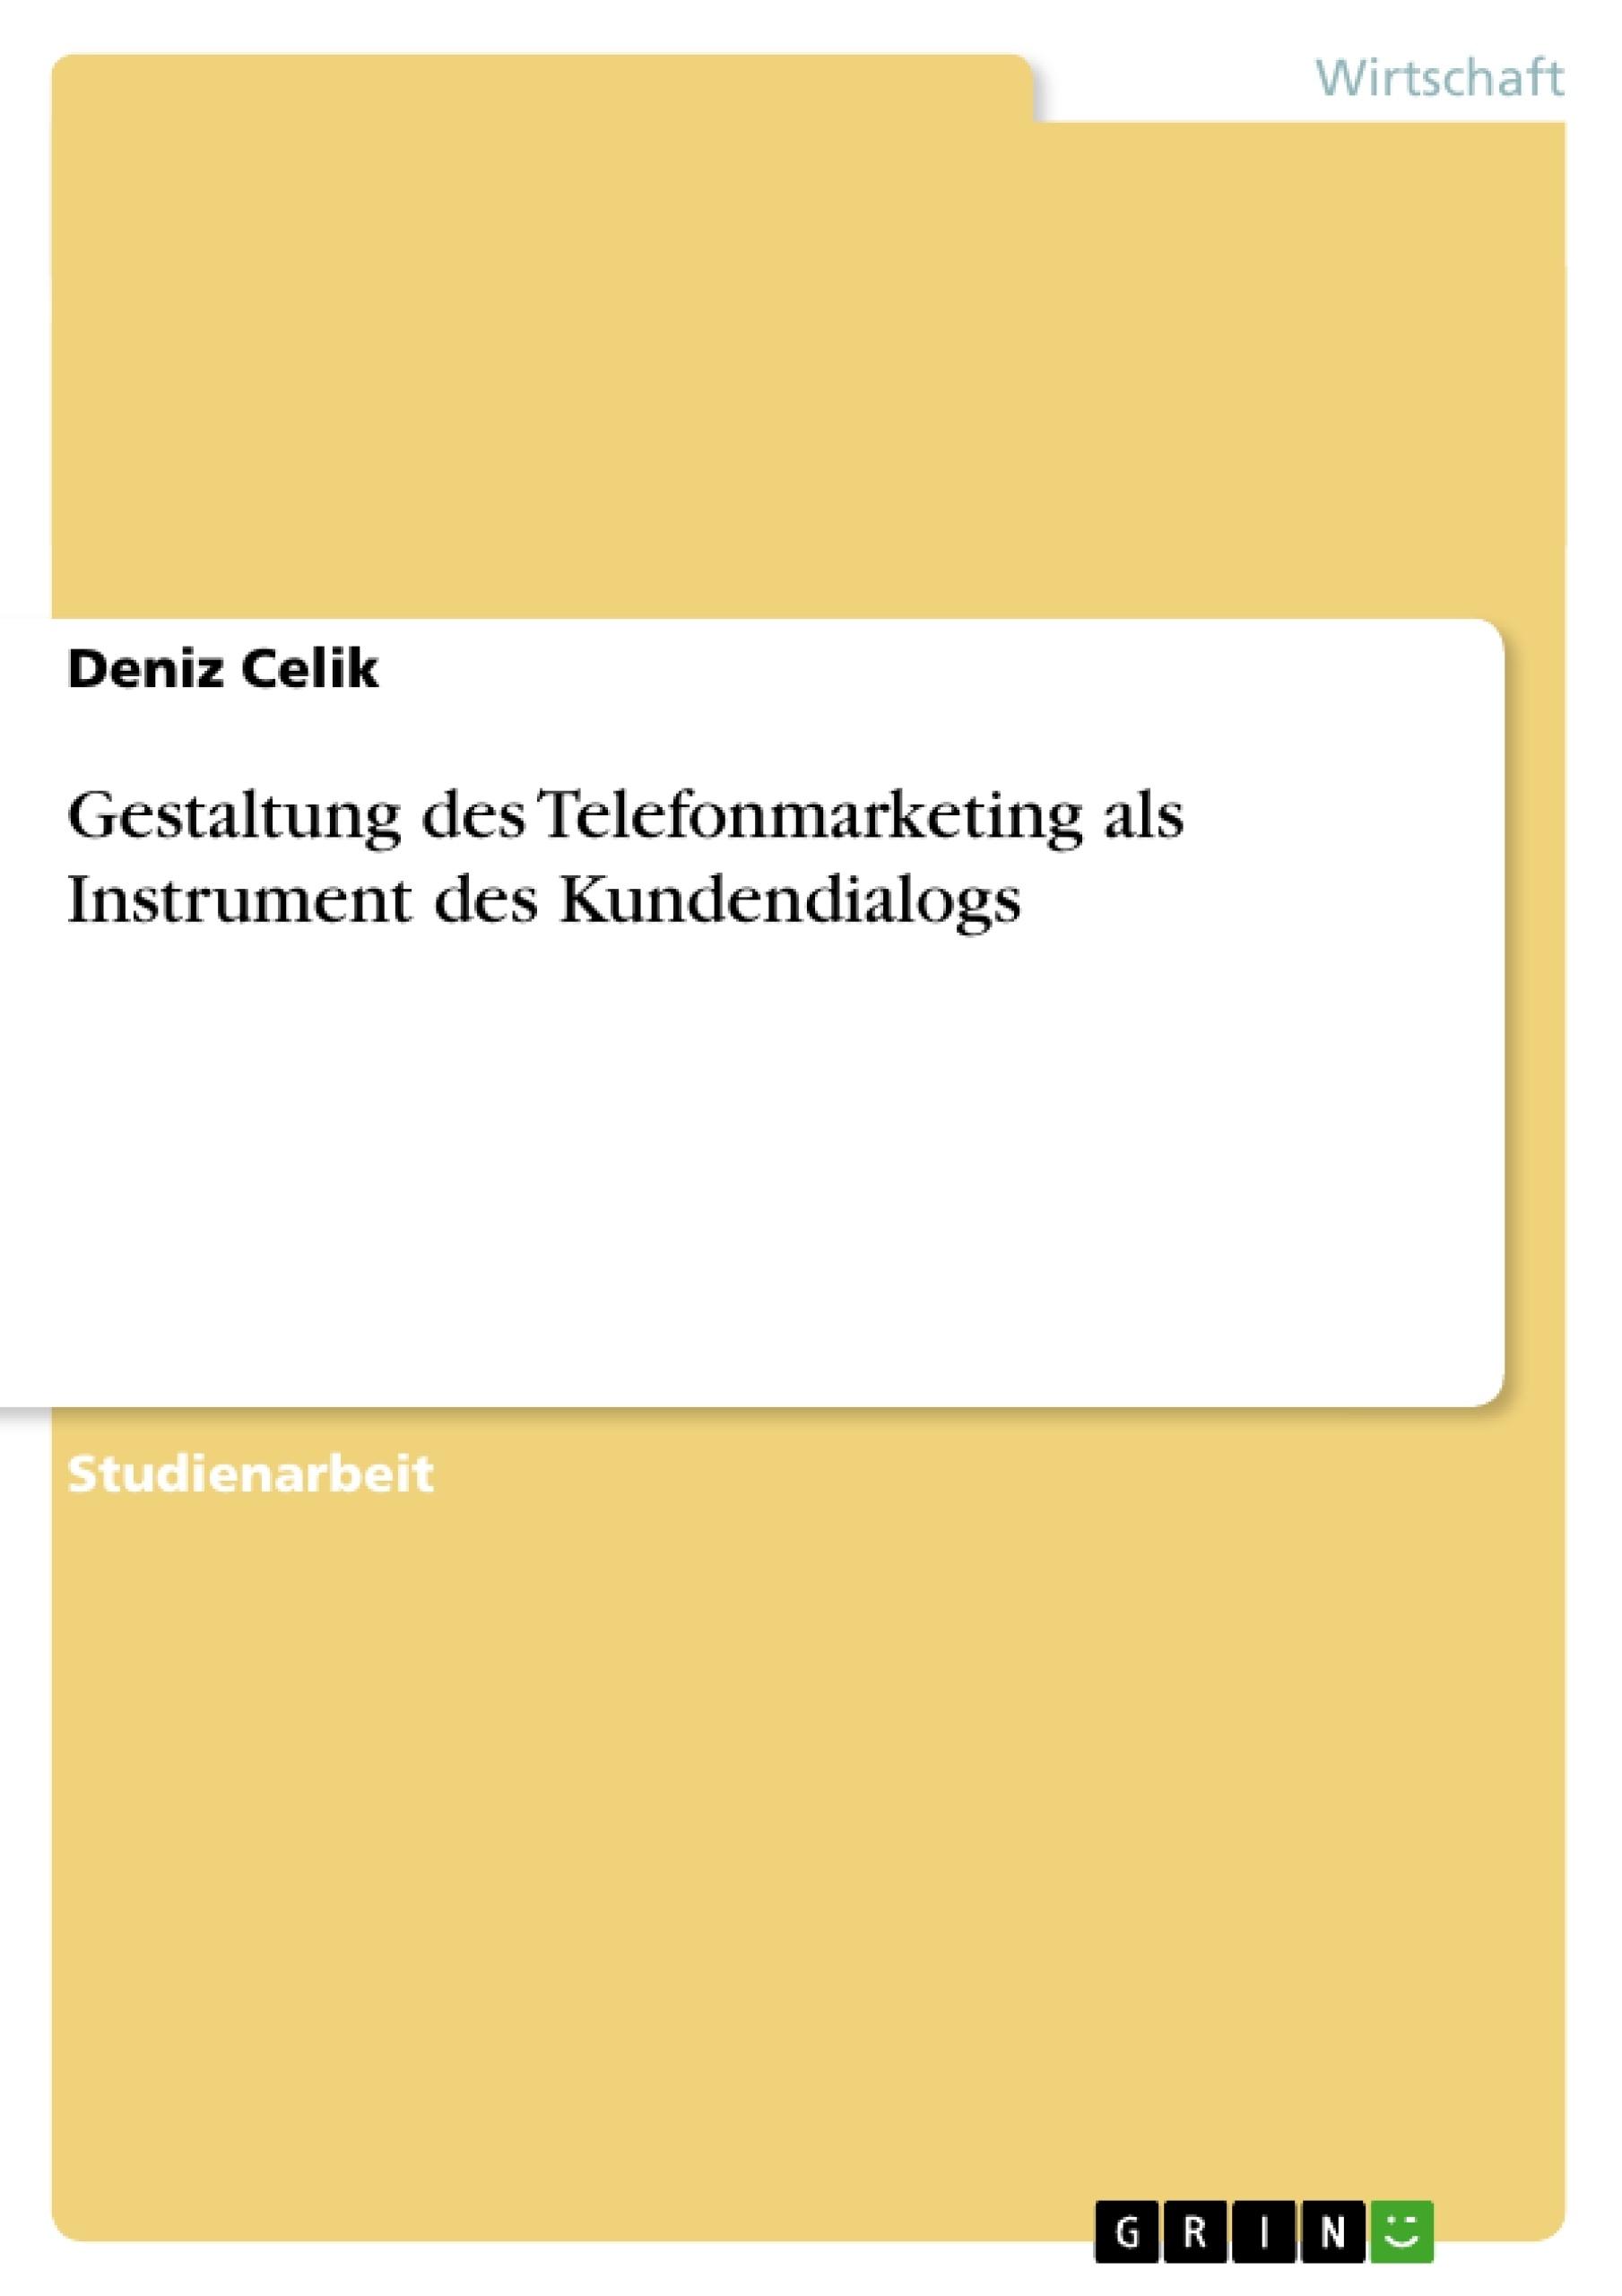 Titel: Gestaltung des Telefonmarketing als Instrument des Kundendialogs